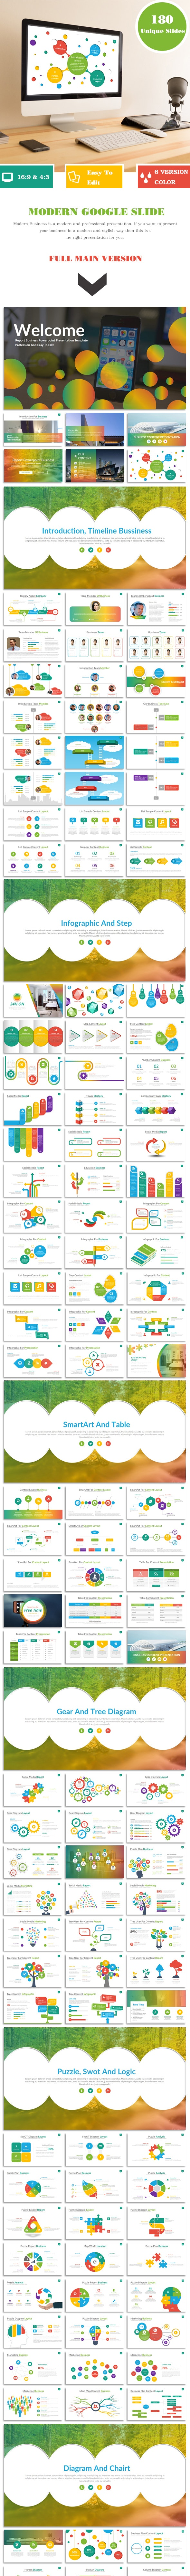 Modern google slide business presentation template for report and plan - Google Slides Presentation Templates